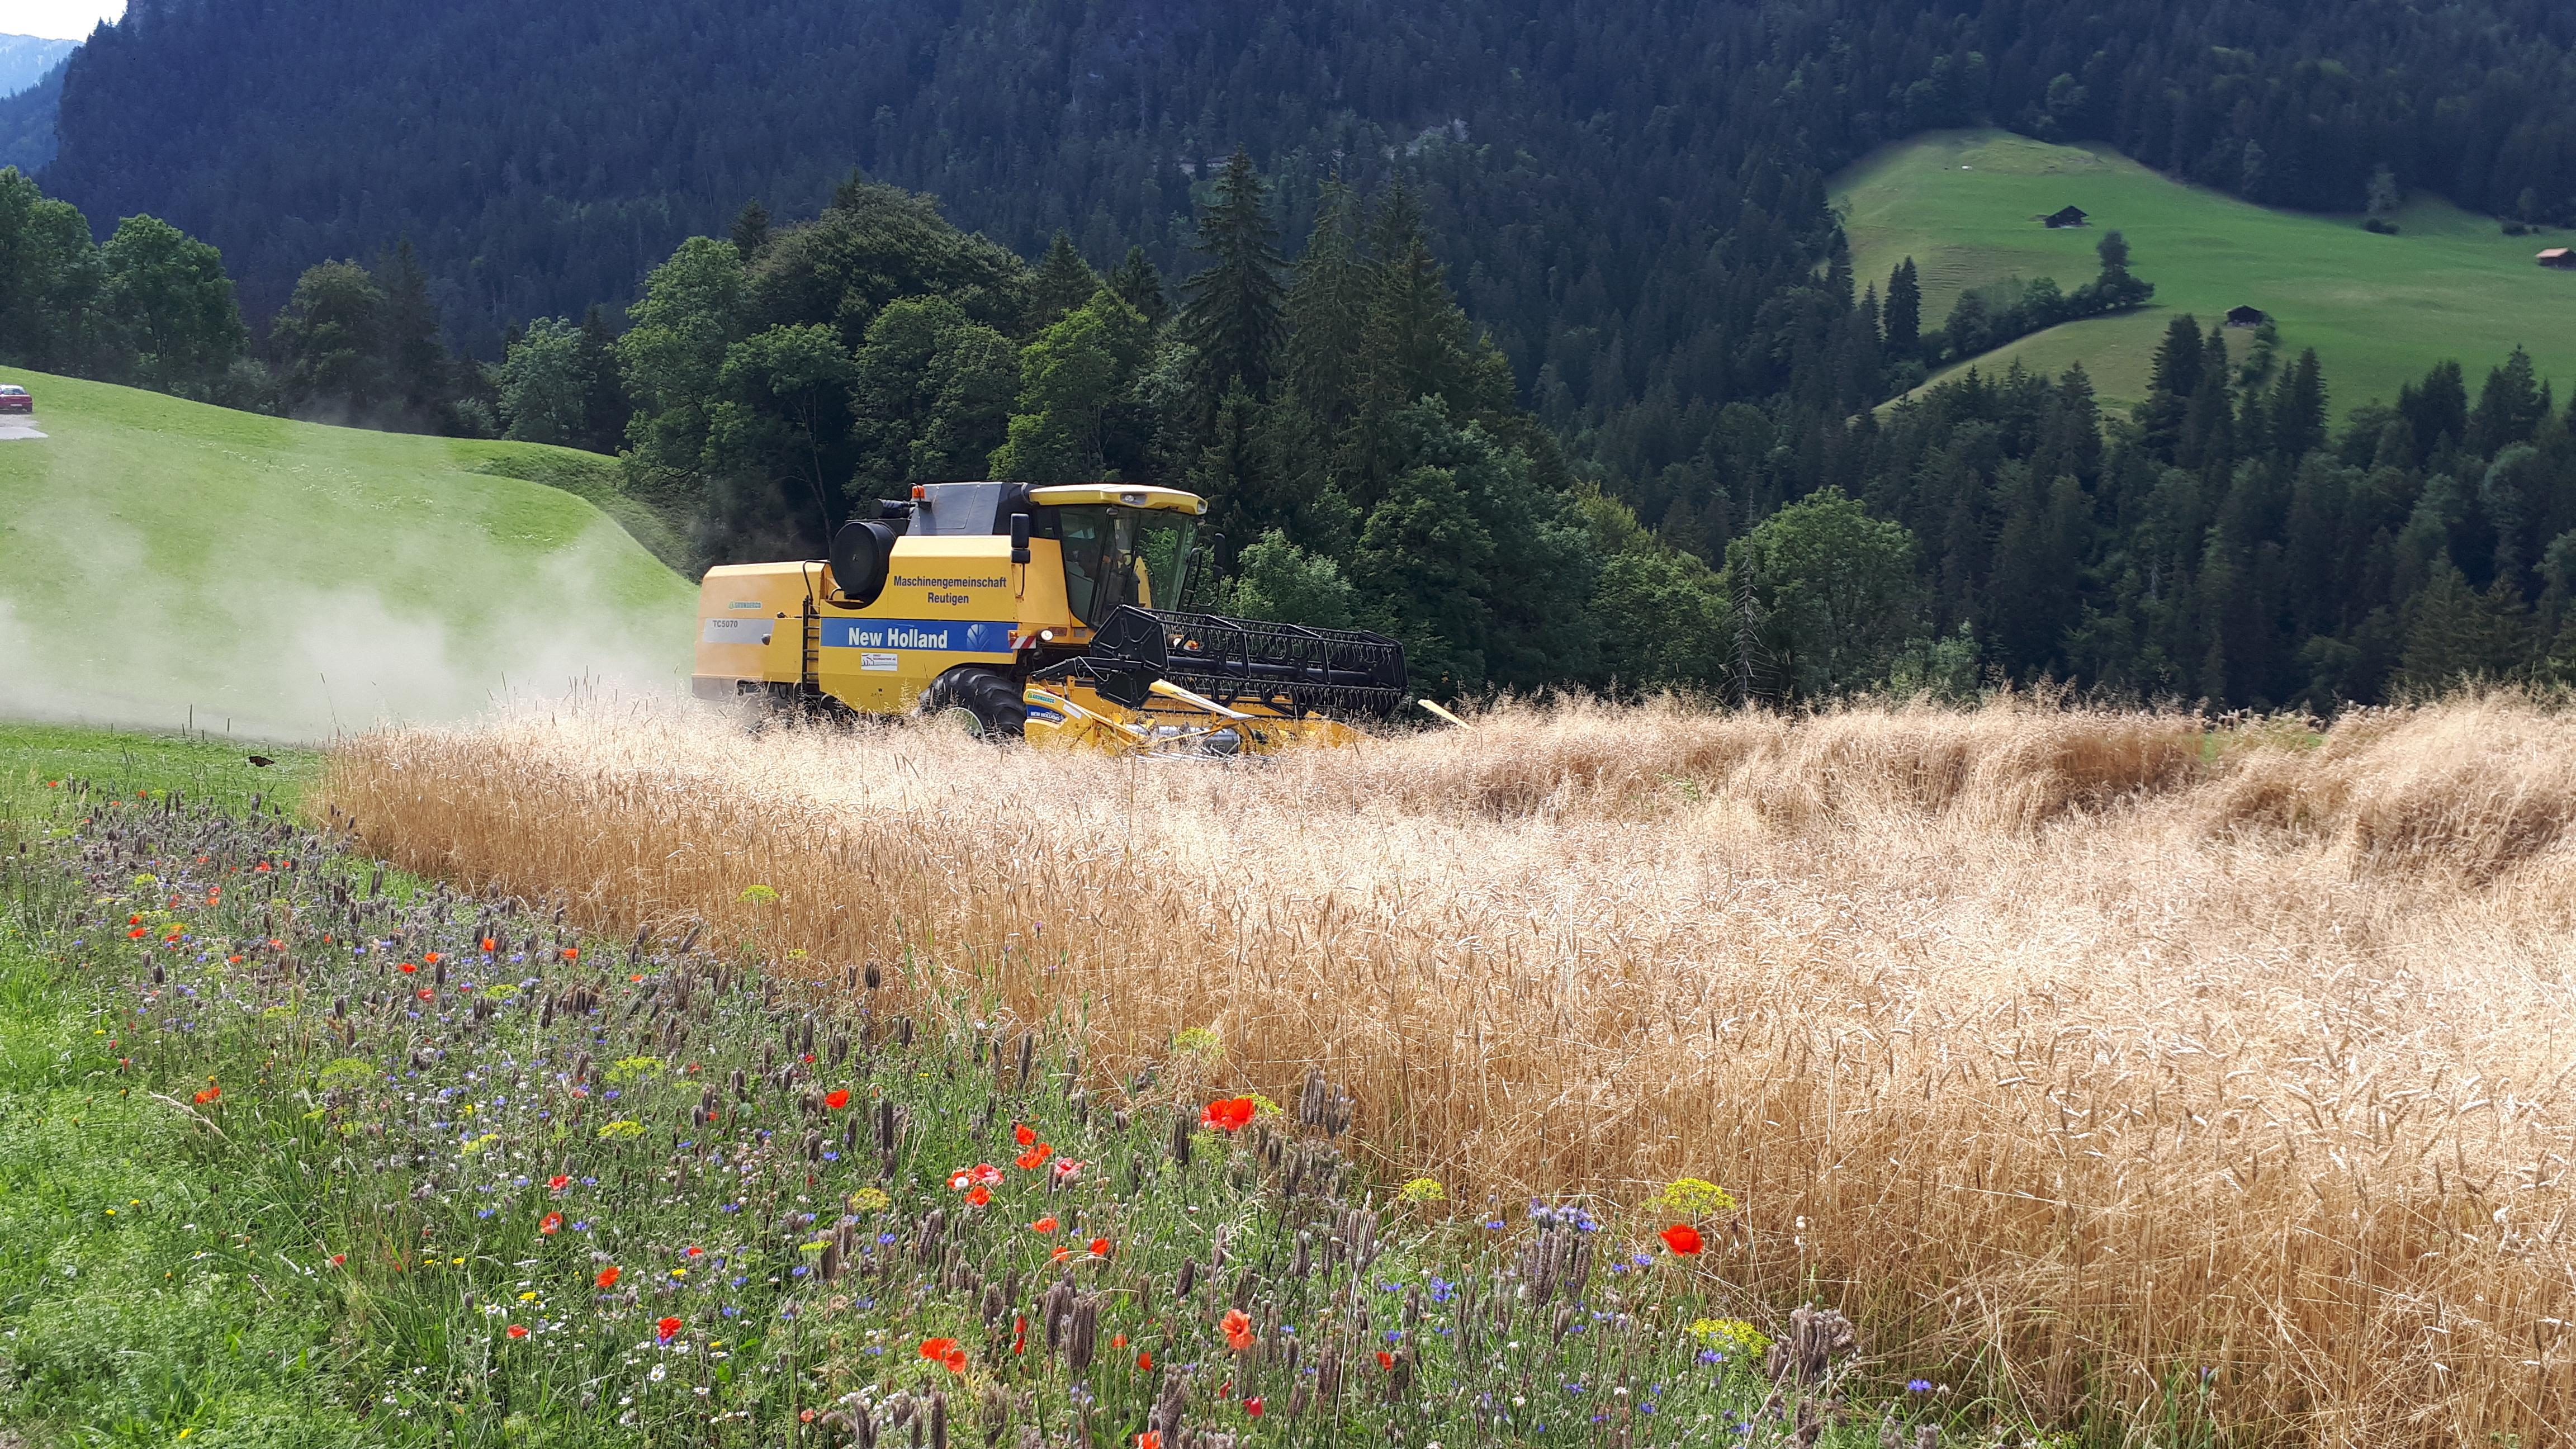 Getreideanbau im Diemtigtal - Innovation oder Illusion?